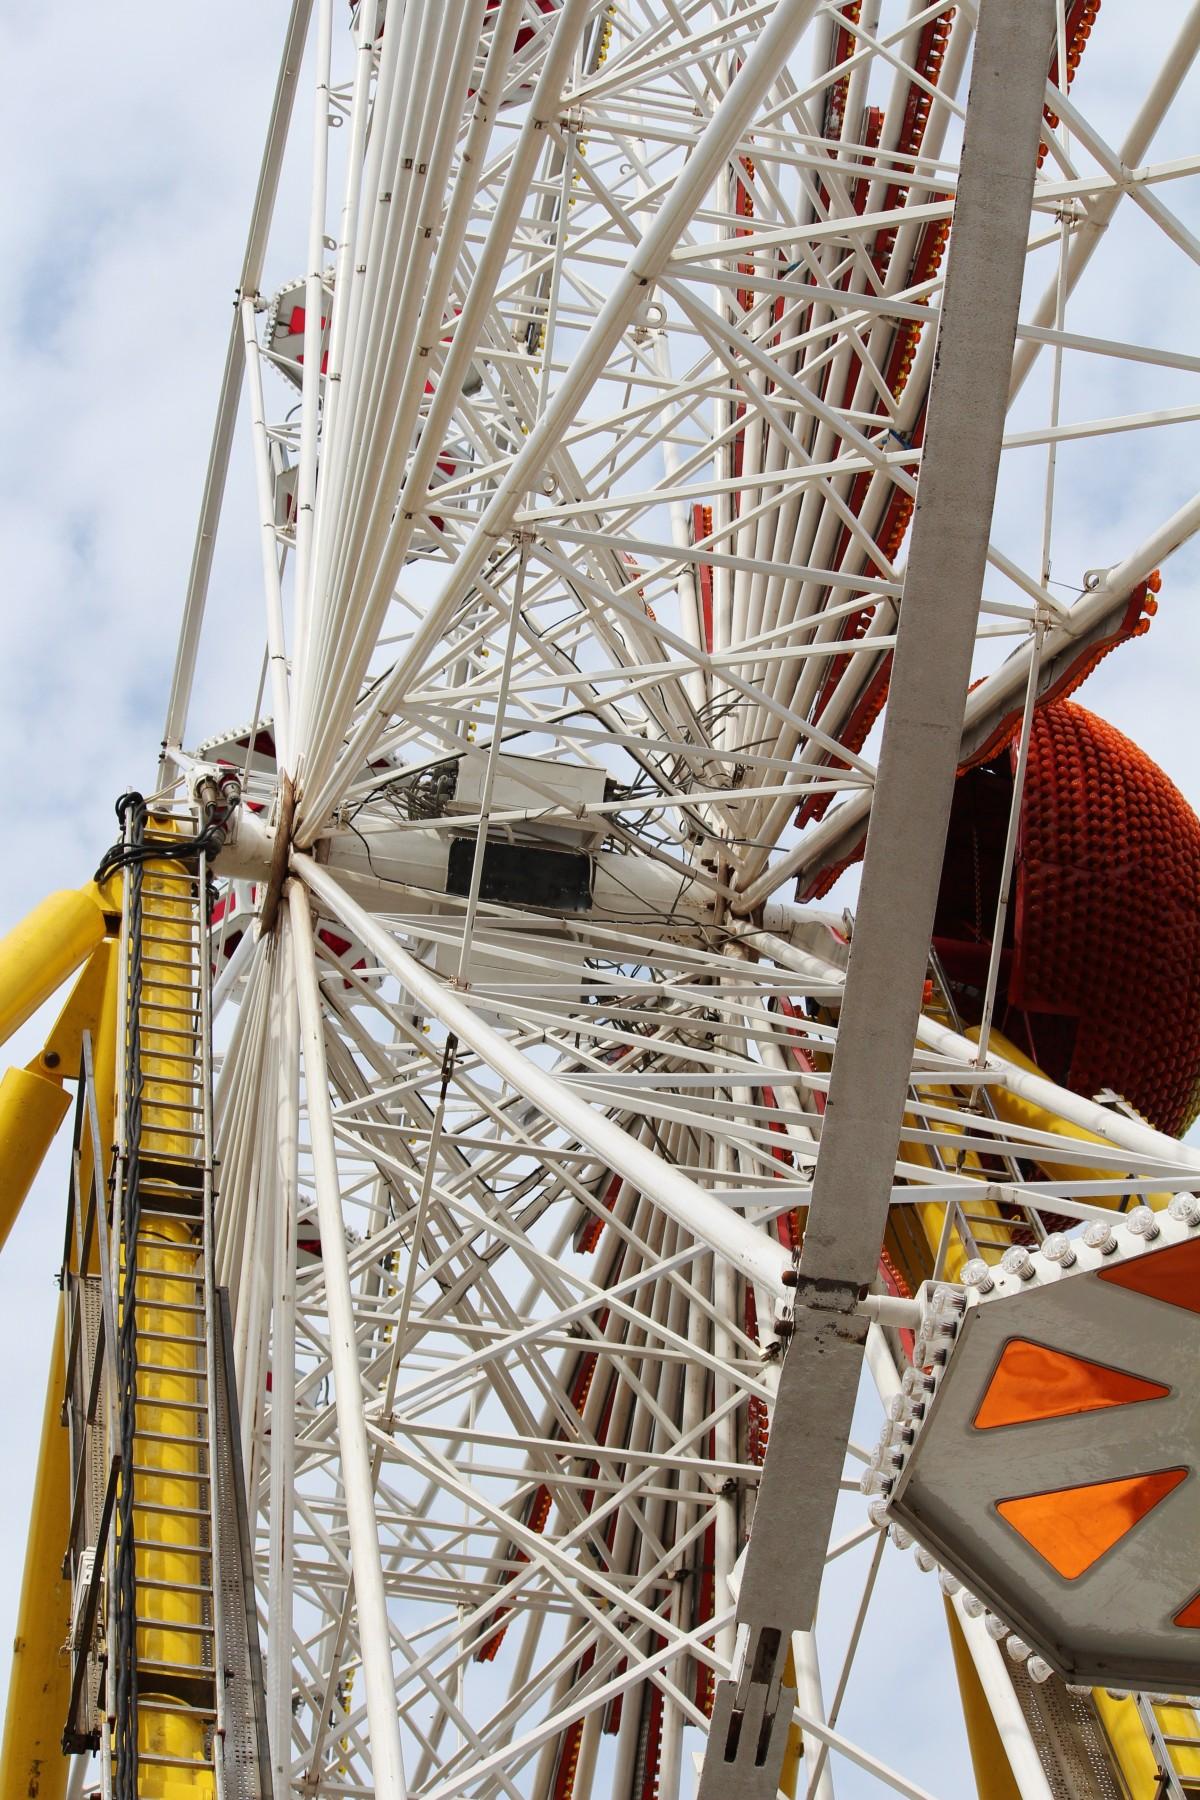 Free Images : sky, summer, ferris wheel, amusement park ...